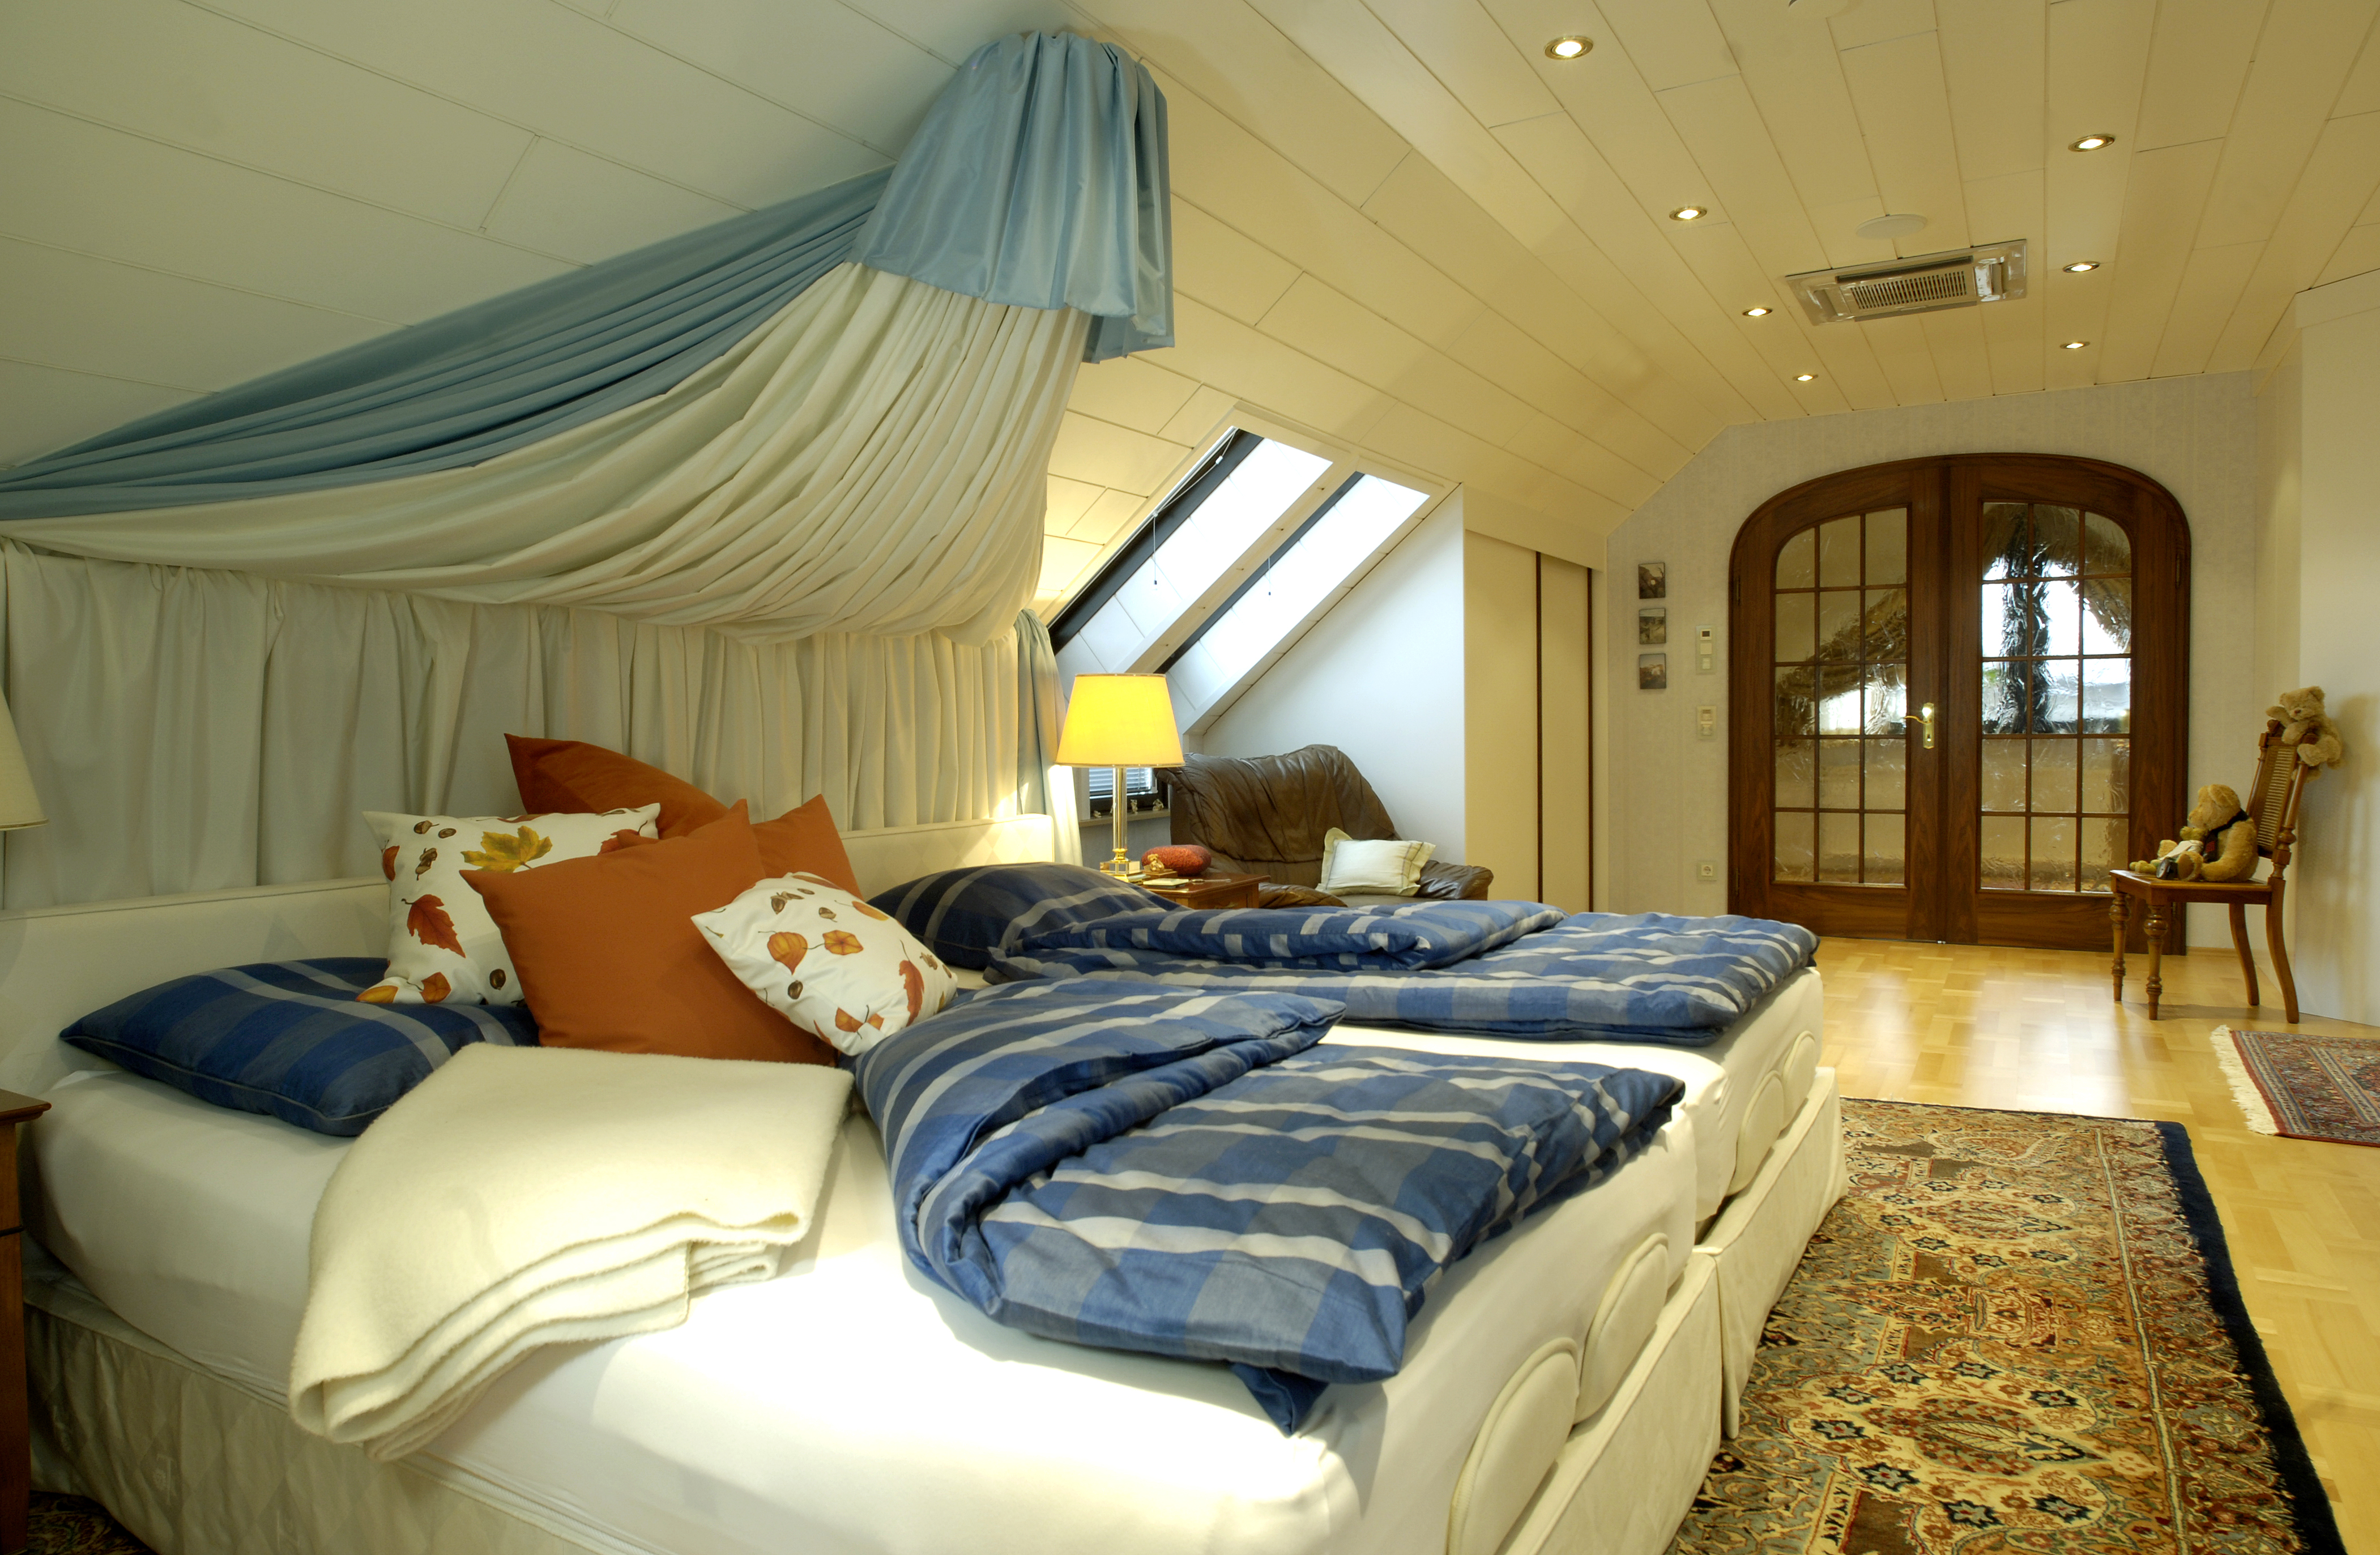 hausanbau hausumbau hausausbau m ag. Black Bedroom Furniture Sets. Home Design Ideas